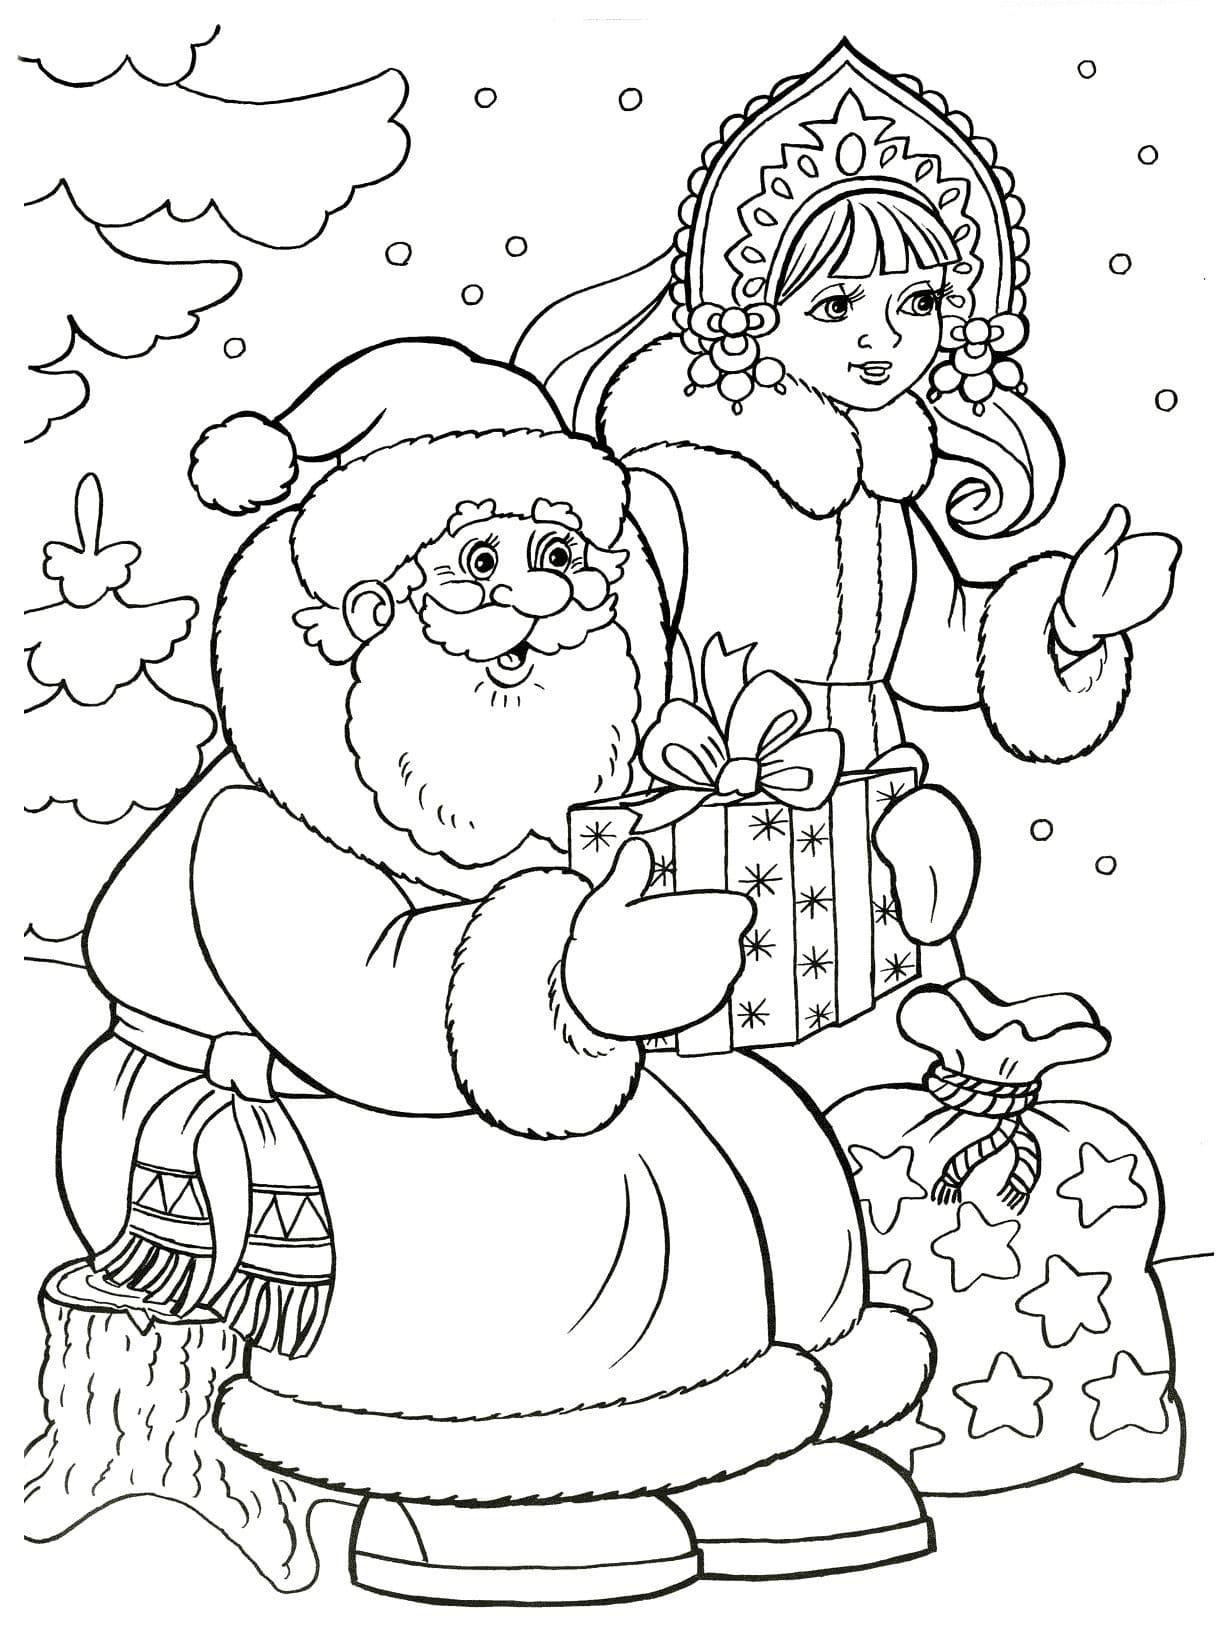 Дед мороз и снегурочка картинки рисунки для срисовки